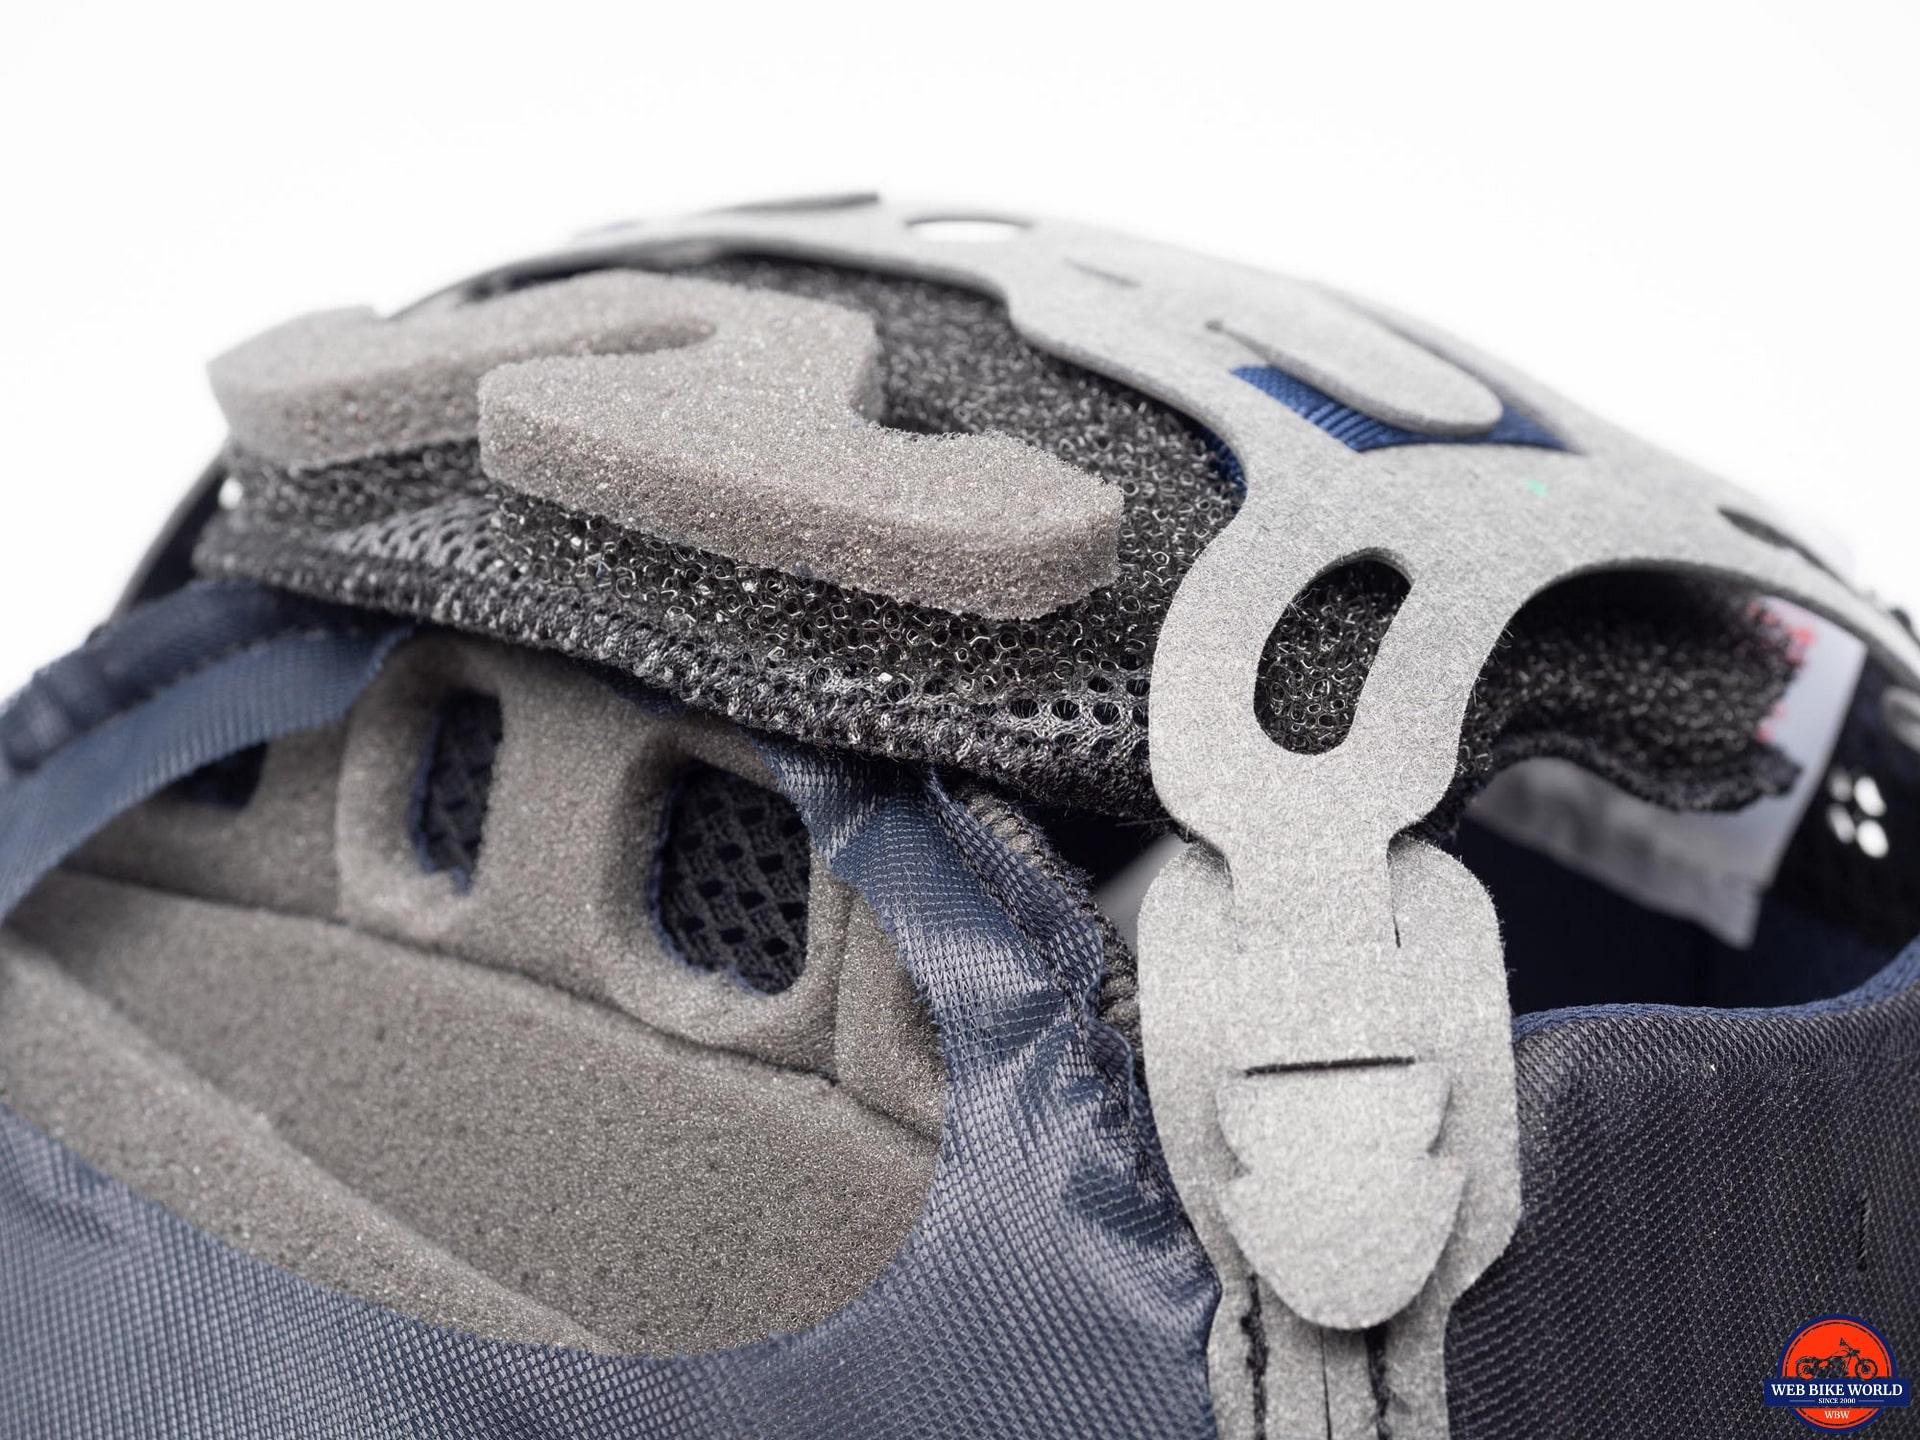 Arai Corsair-X Rea 5 Graphic Helmet fitment adjusters